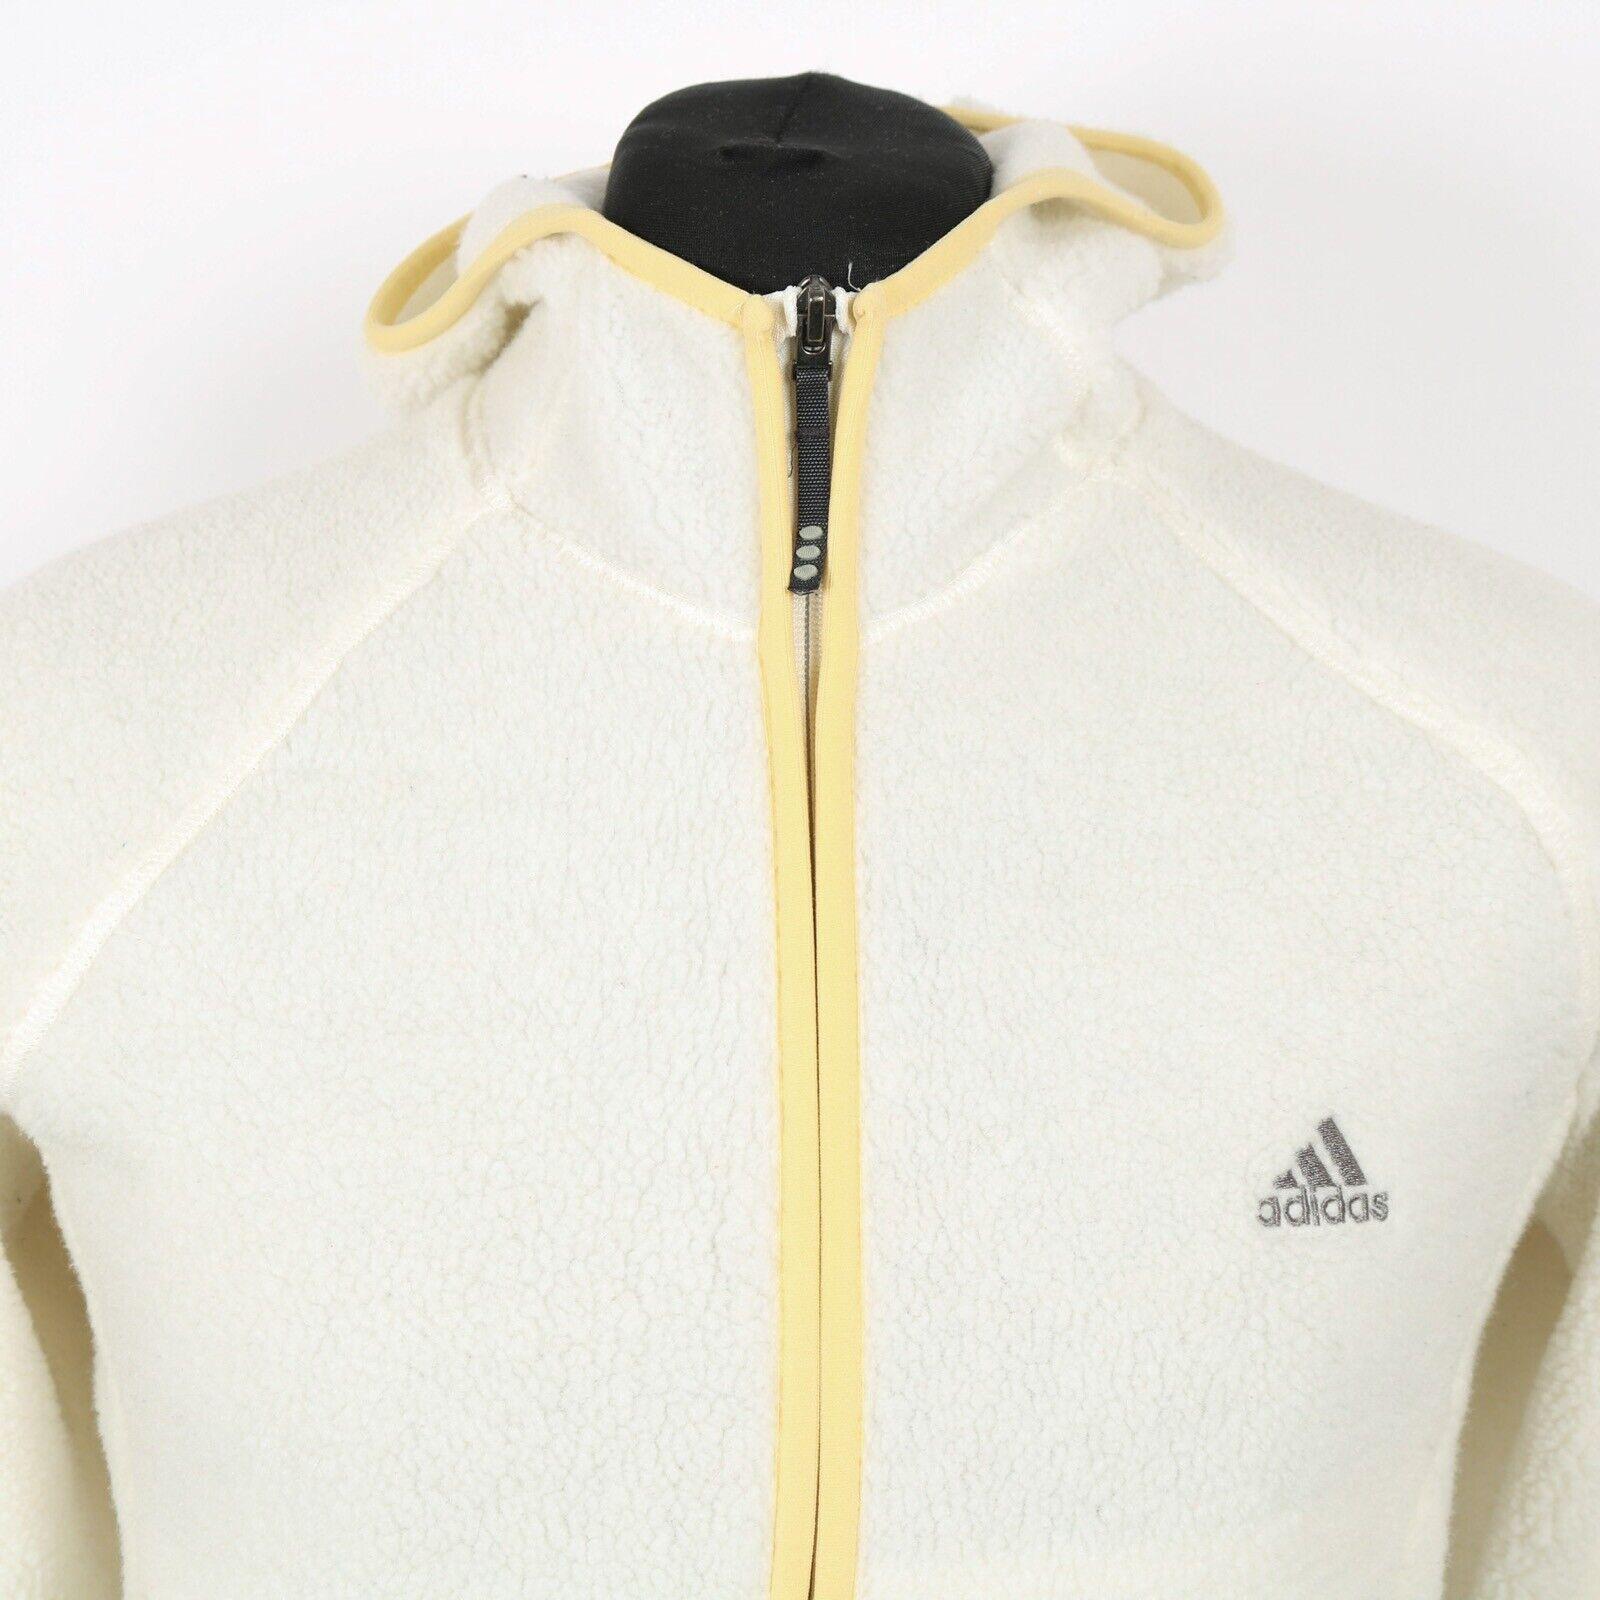 Vintage ADIDAS Thick Sherpa Fleece Hooded Jacket   Hoodie Climawarm Coat Retro